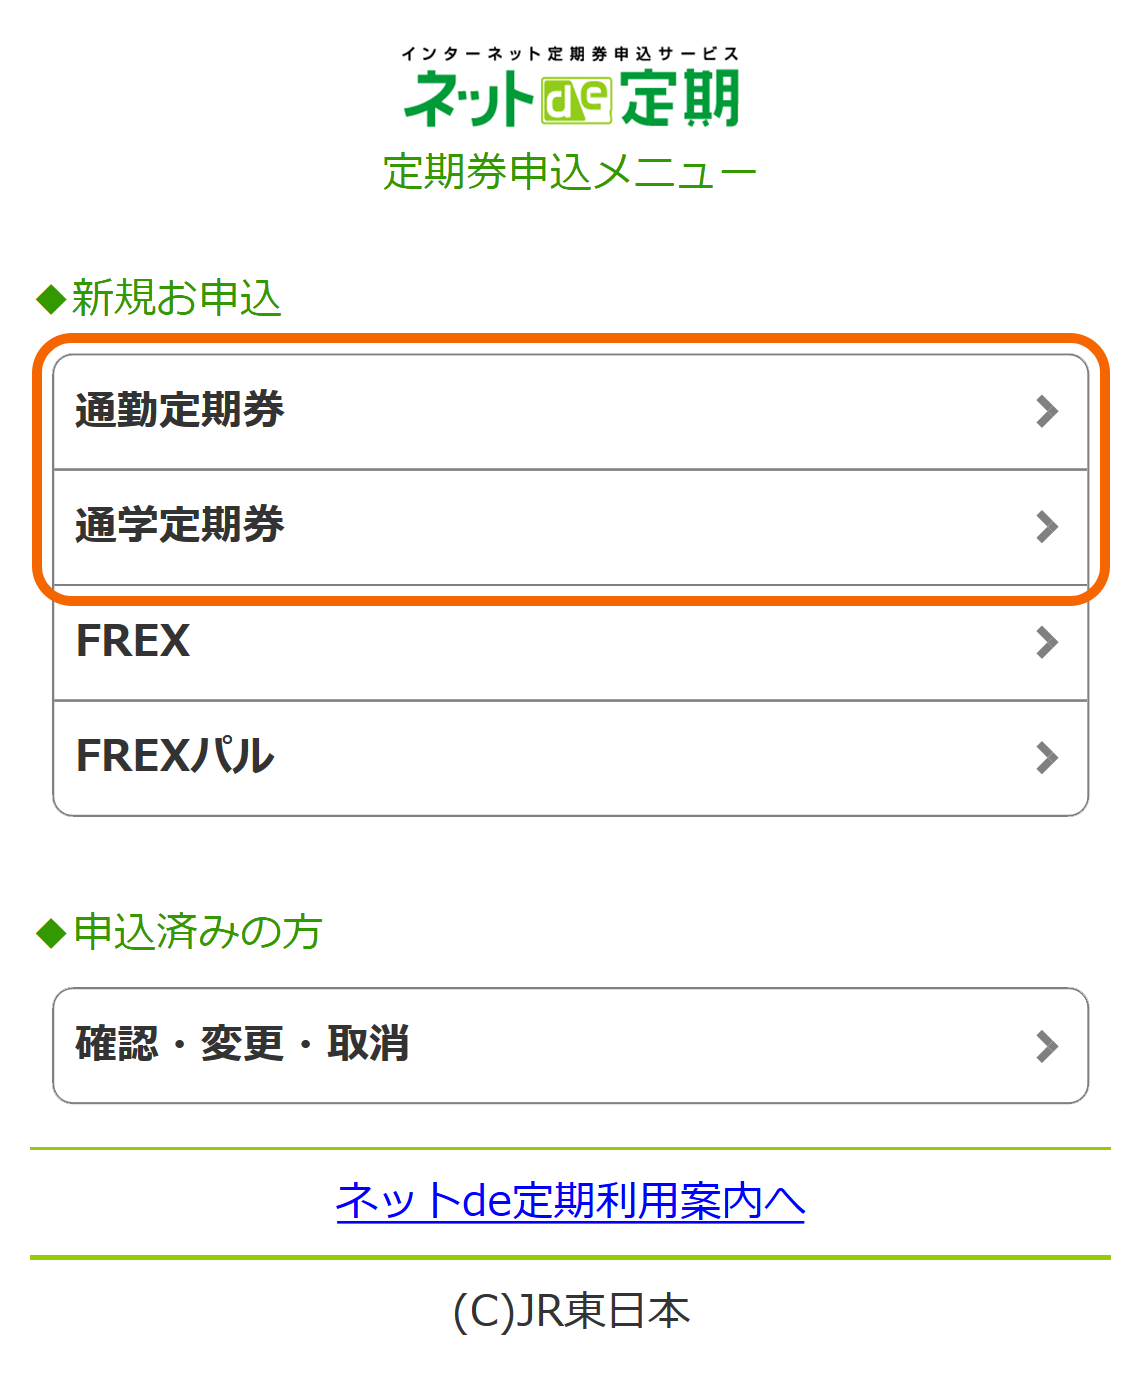 jr 北海道 定期 券 払い戻し